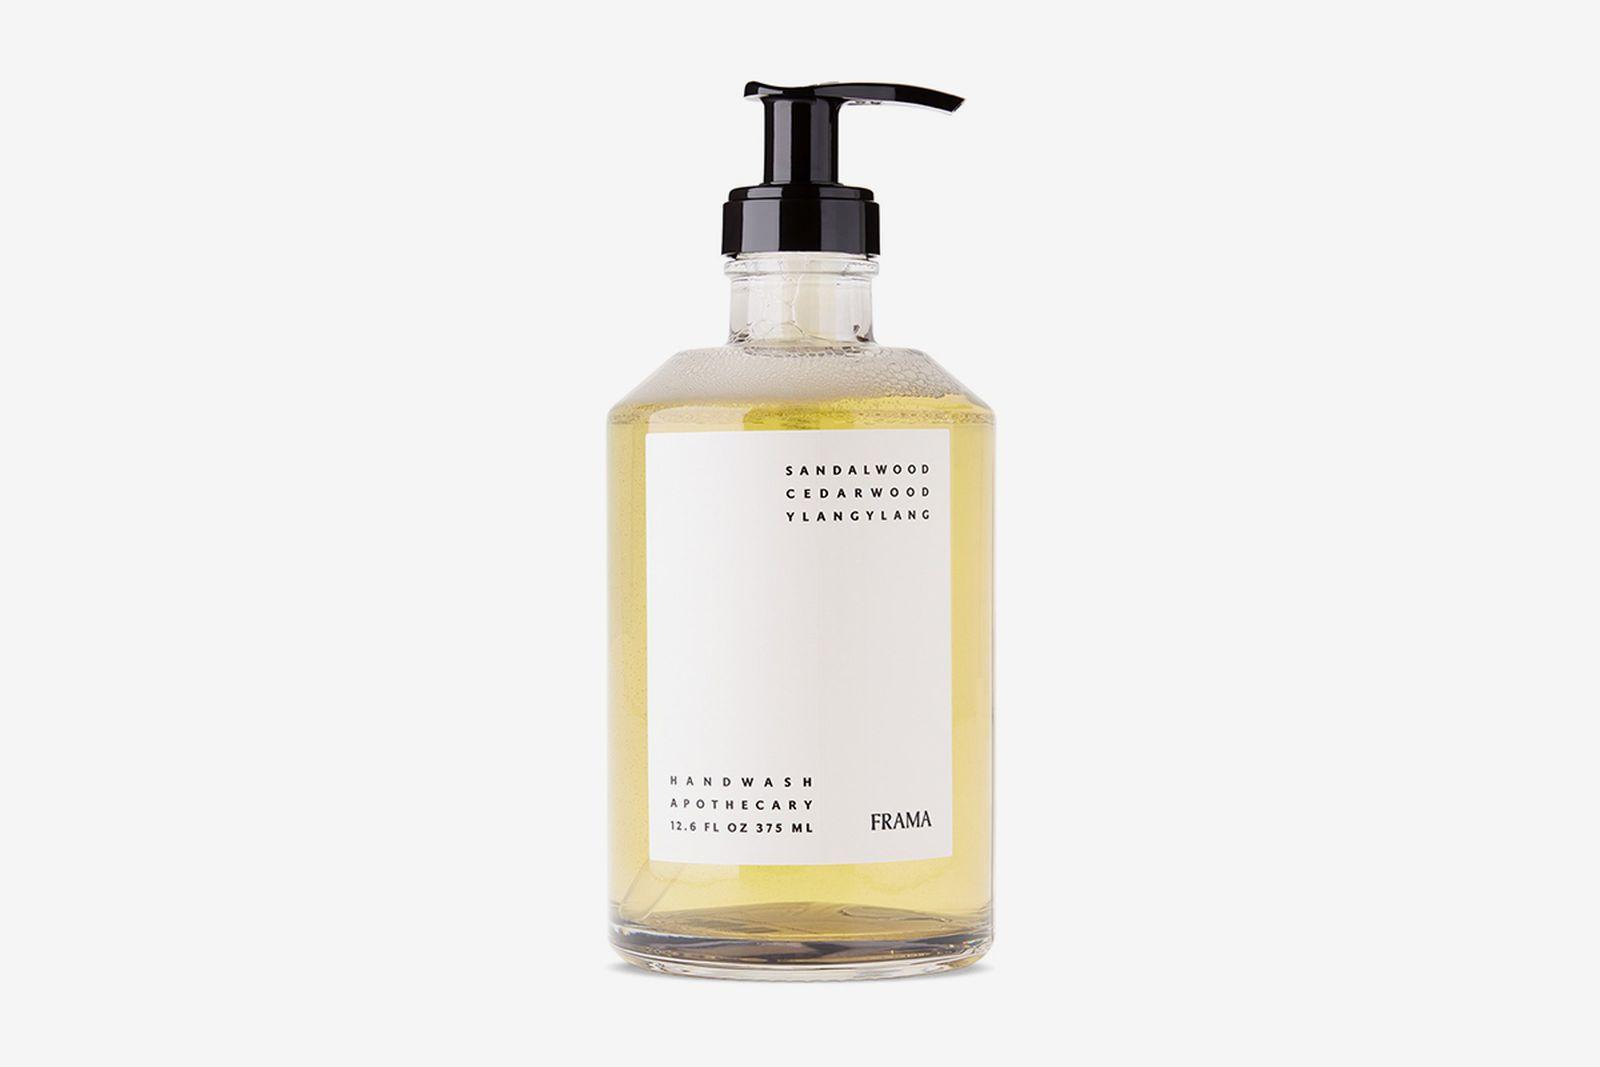 frama-apothecary-hand-wash-126-oz